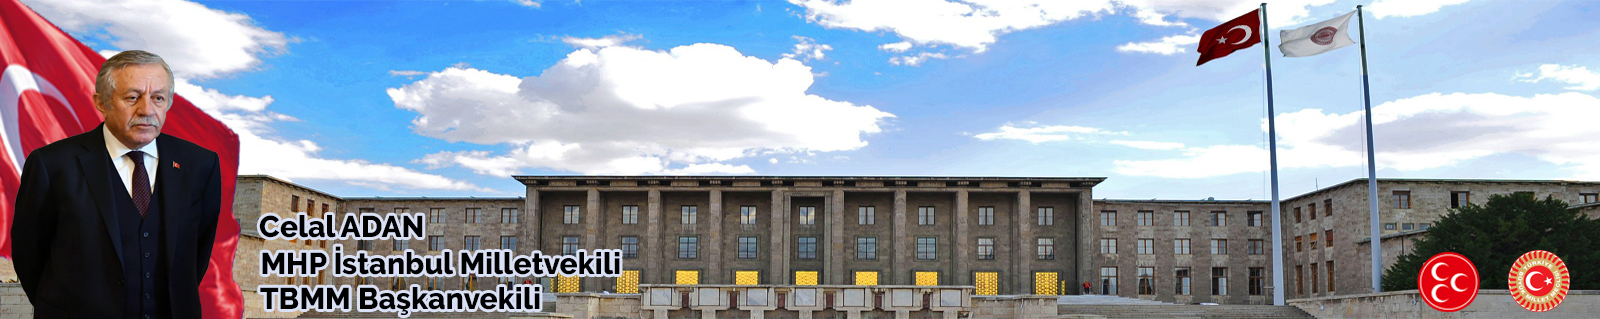 Celal ADAN – MHP İstanbul Milletvekili – TBMM Başkanvekili